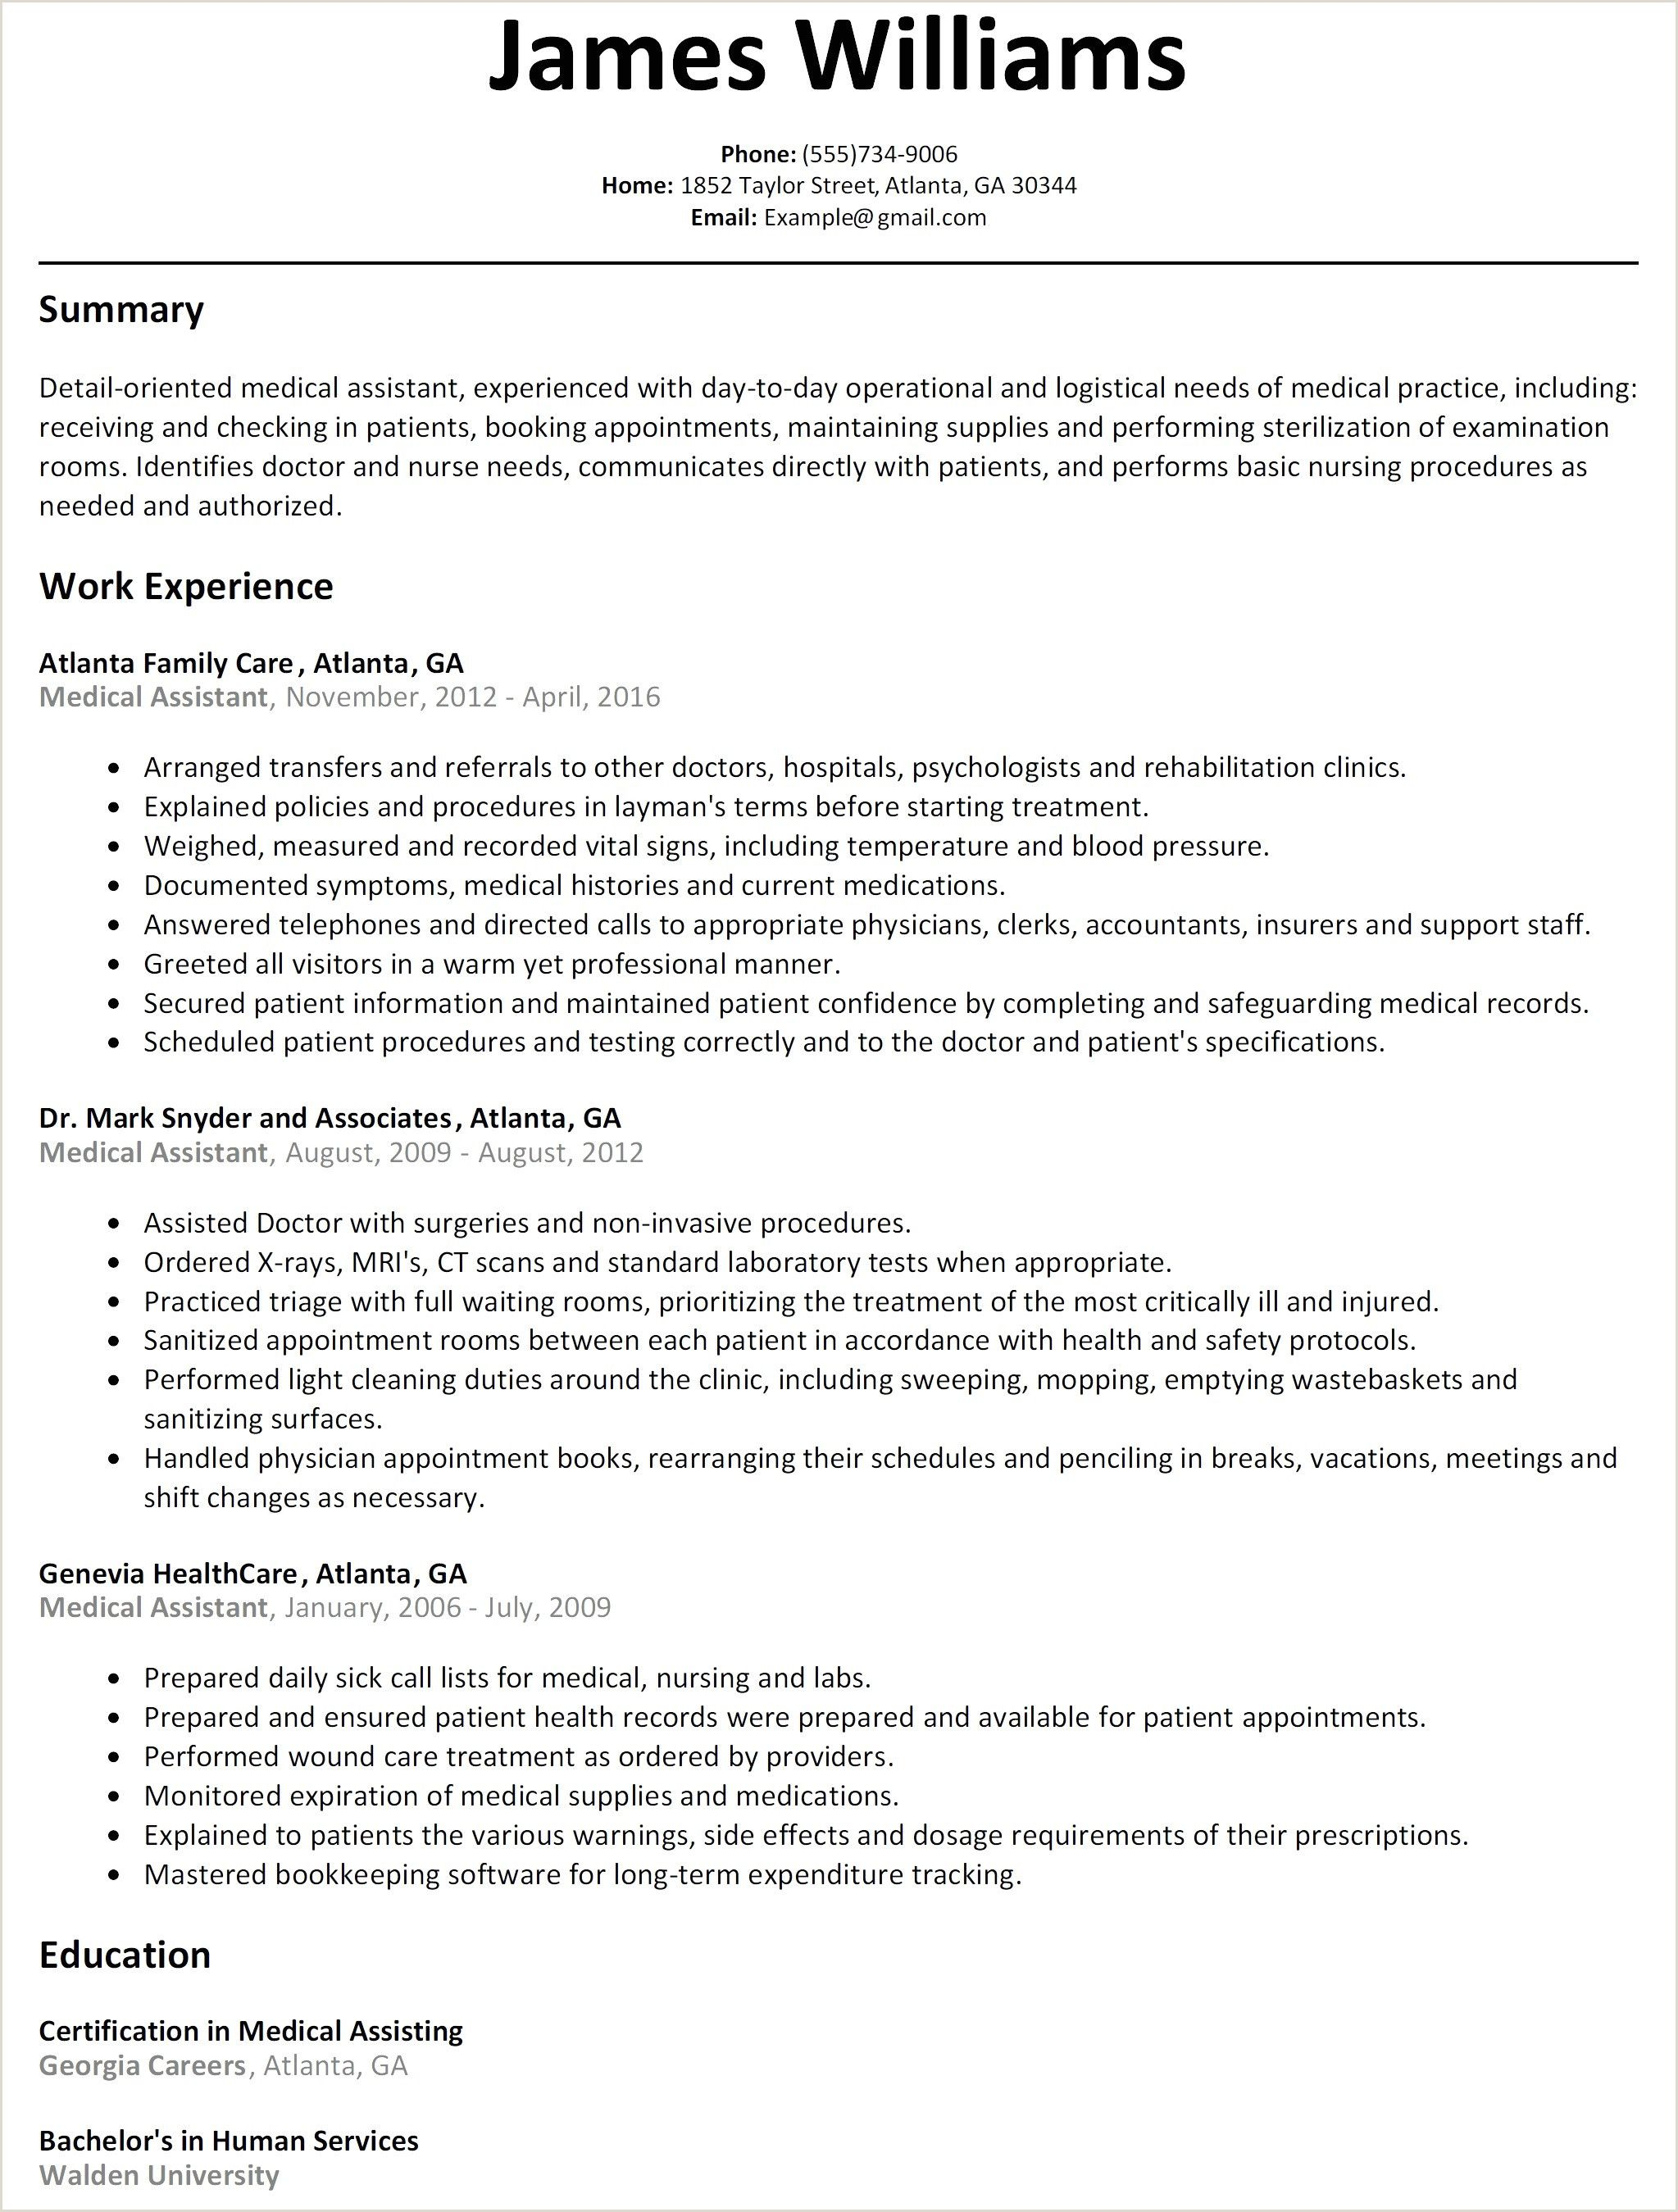 Child Care Resume Sample Australia Teacher Resume Template Resume Examples Resume Skills